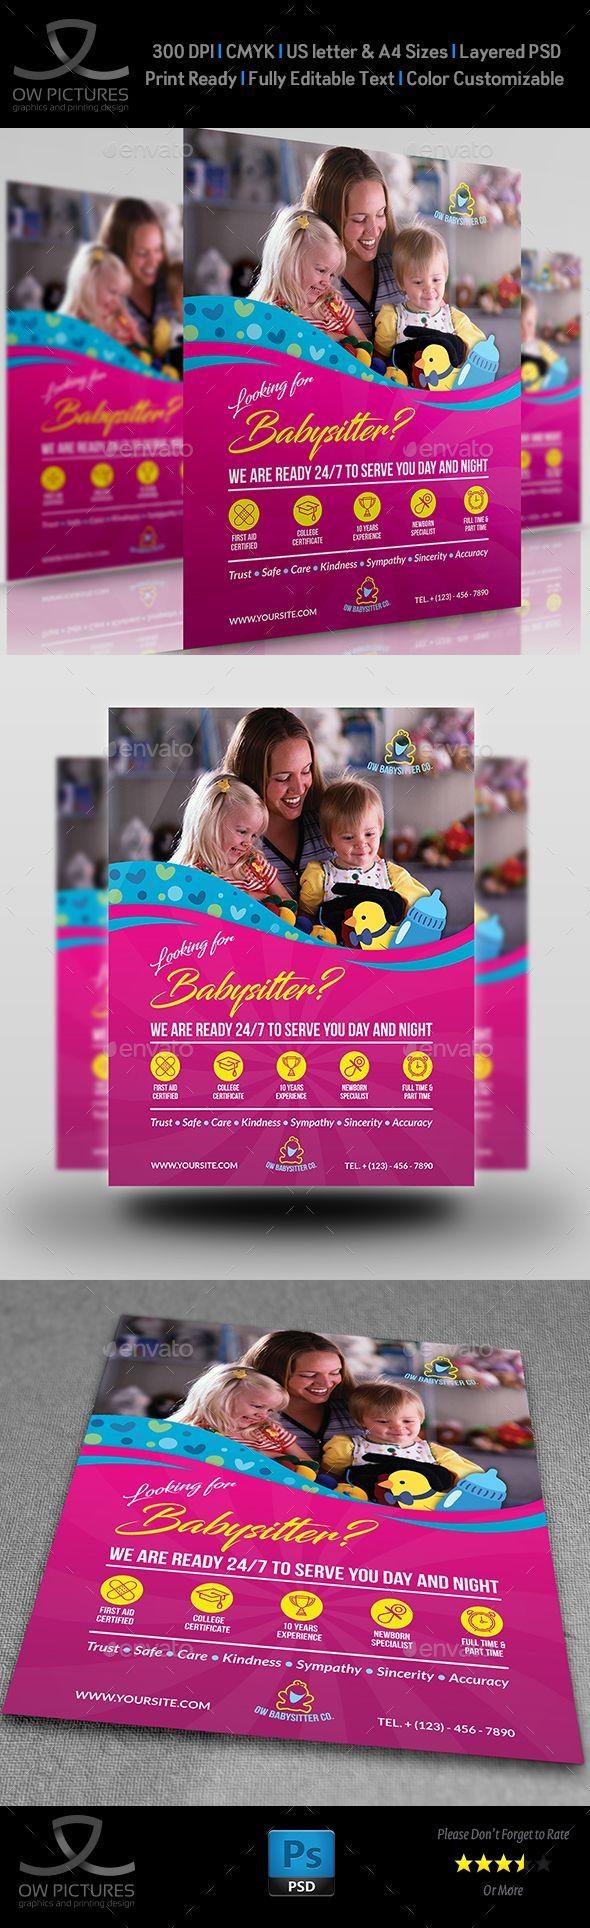 Babysitter Flyer Template Flyer Template Flyer Printing And Print